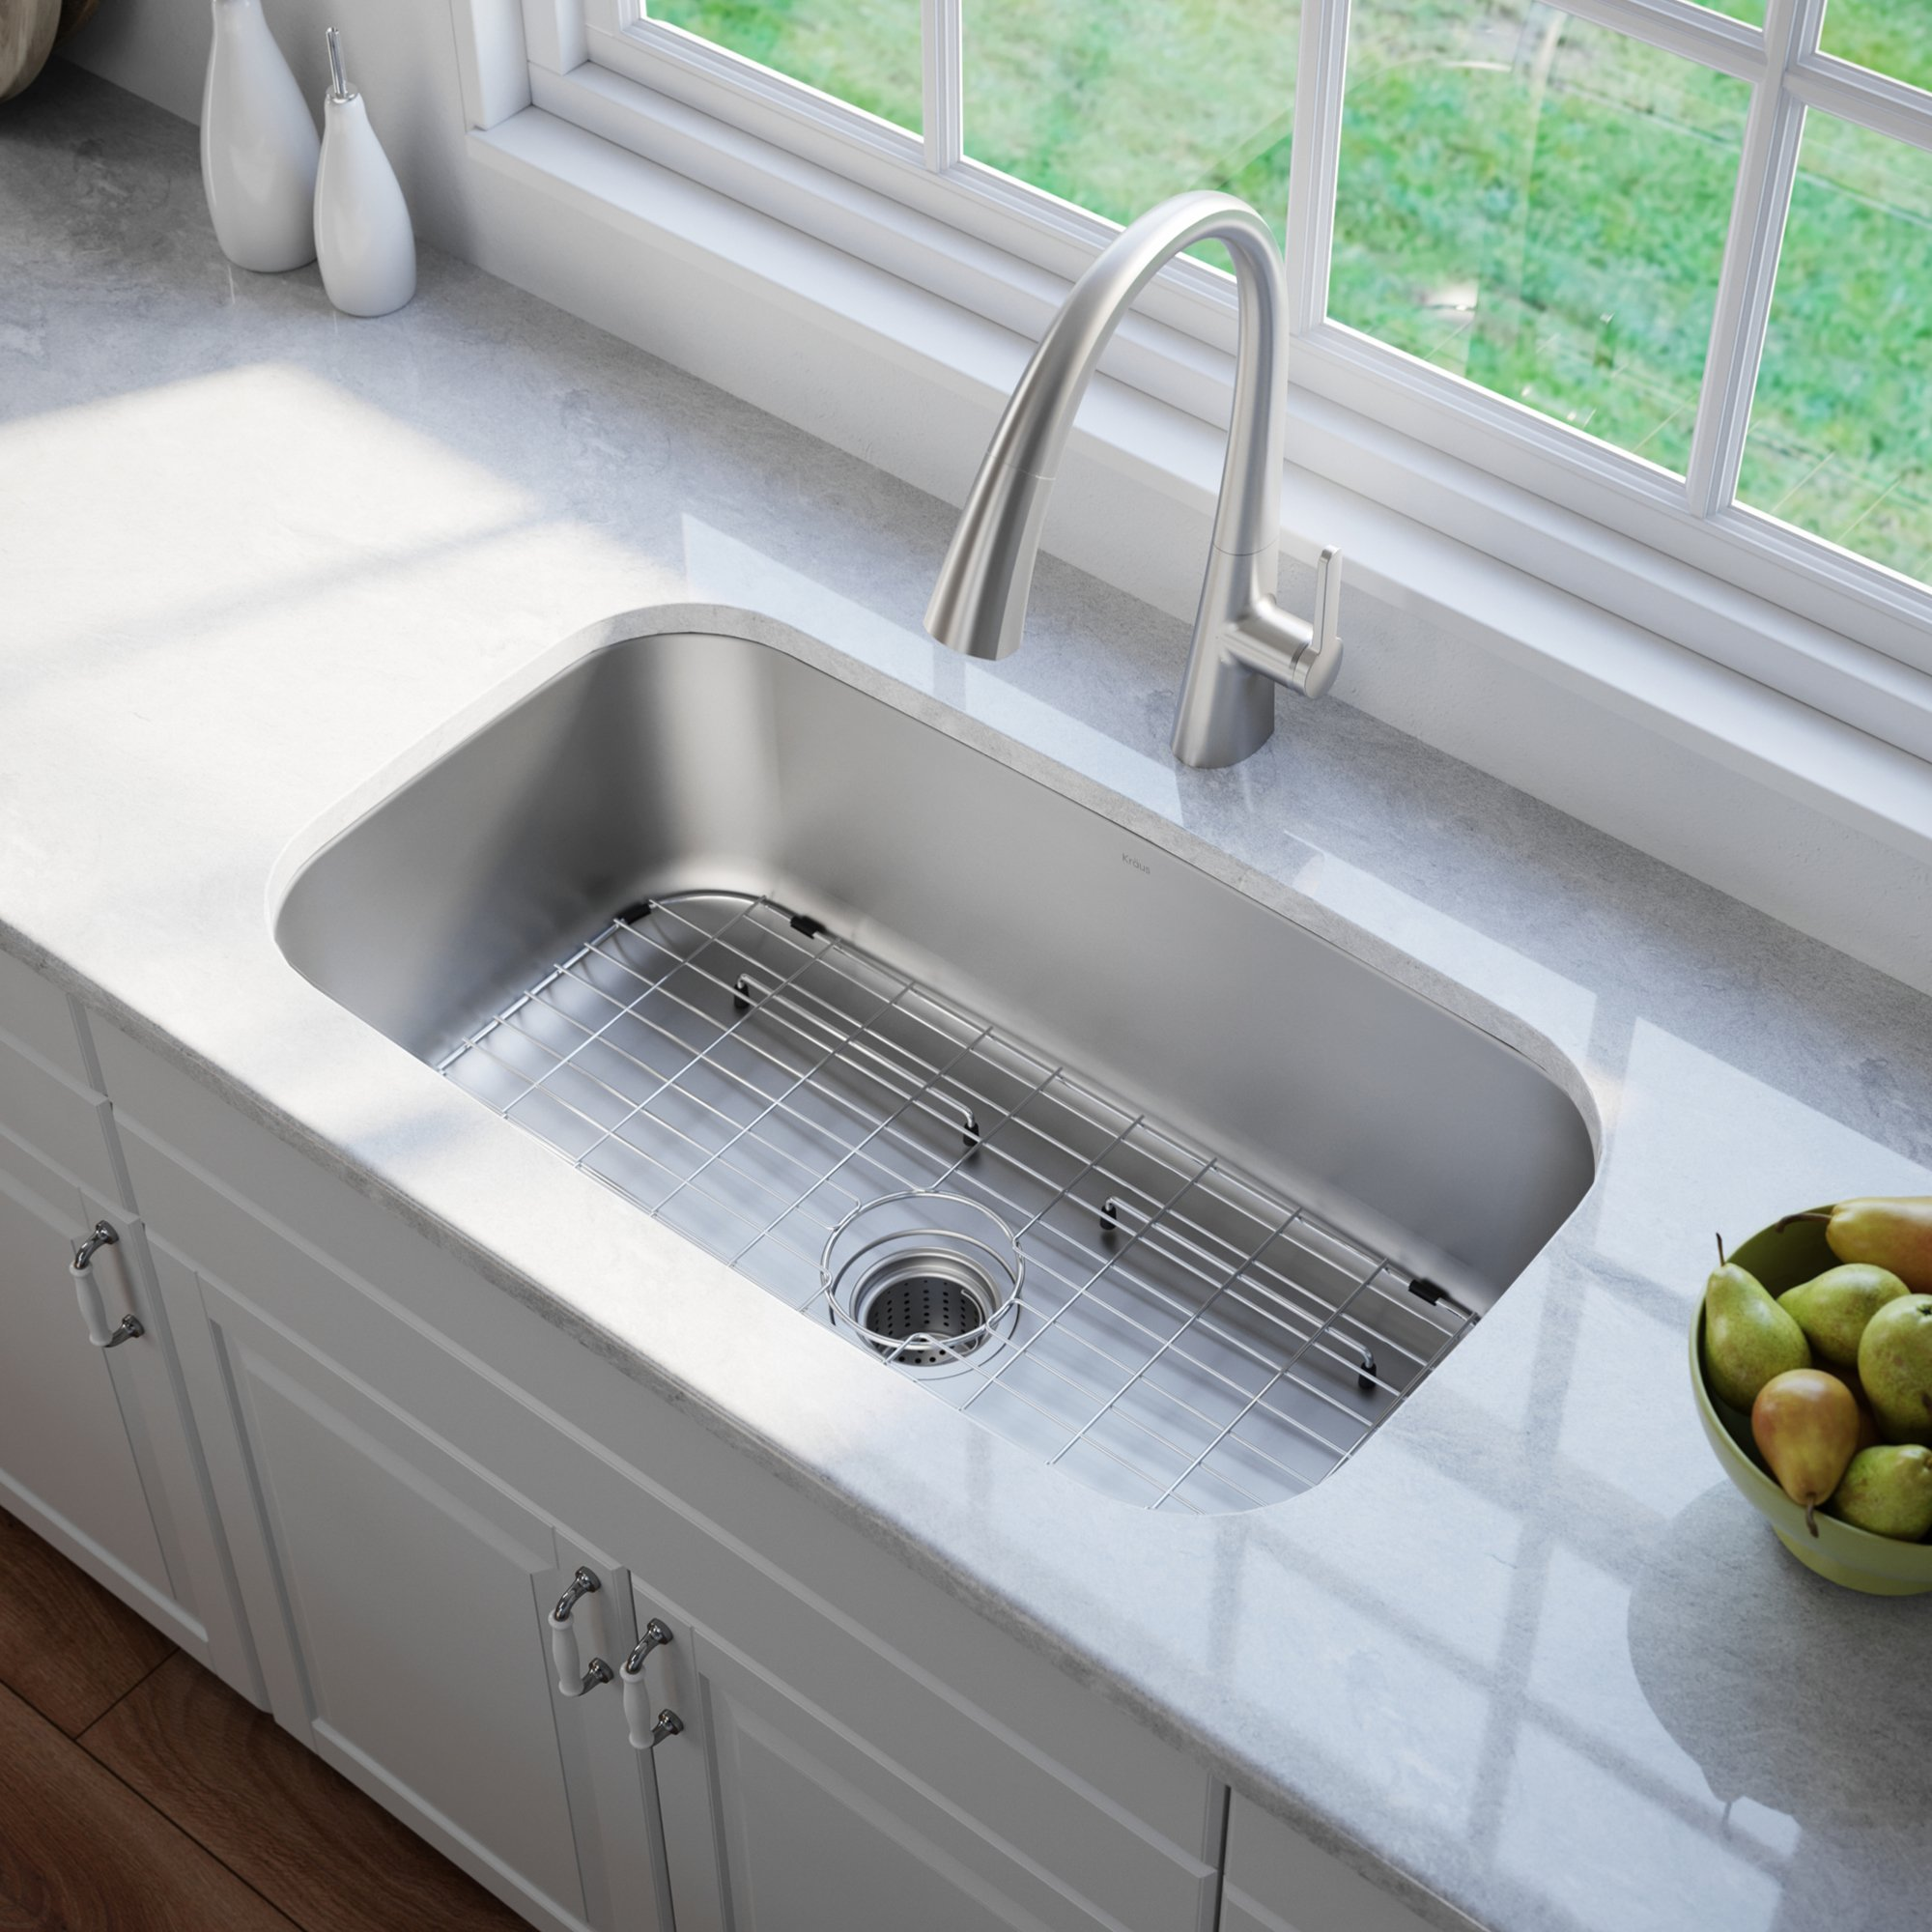 Kraus KBU14 31-1/2 inch Undermount Single Bowl 16-gauge Stainless Steel Kitchen Sink by Kraus (Image #3)